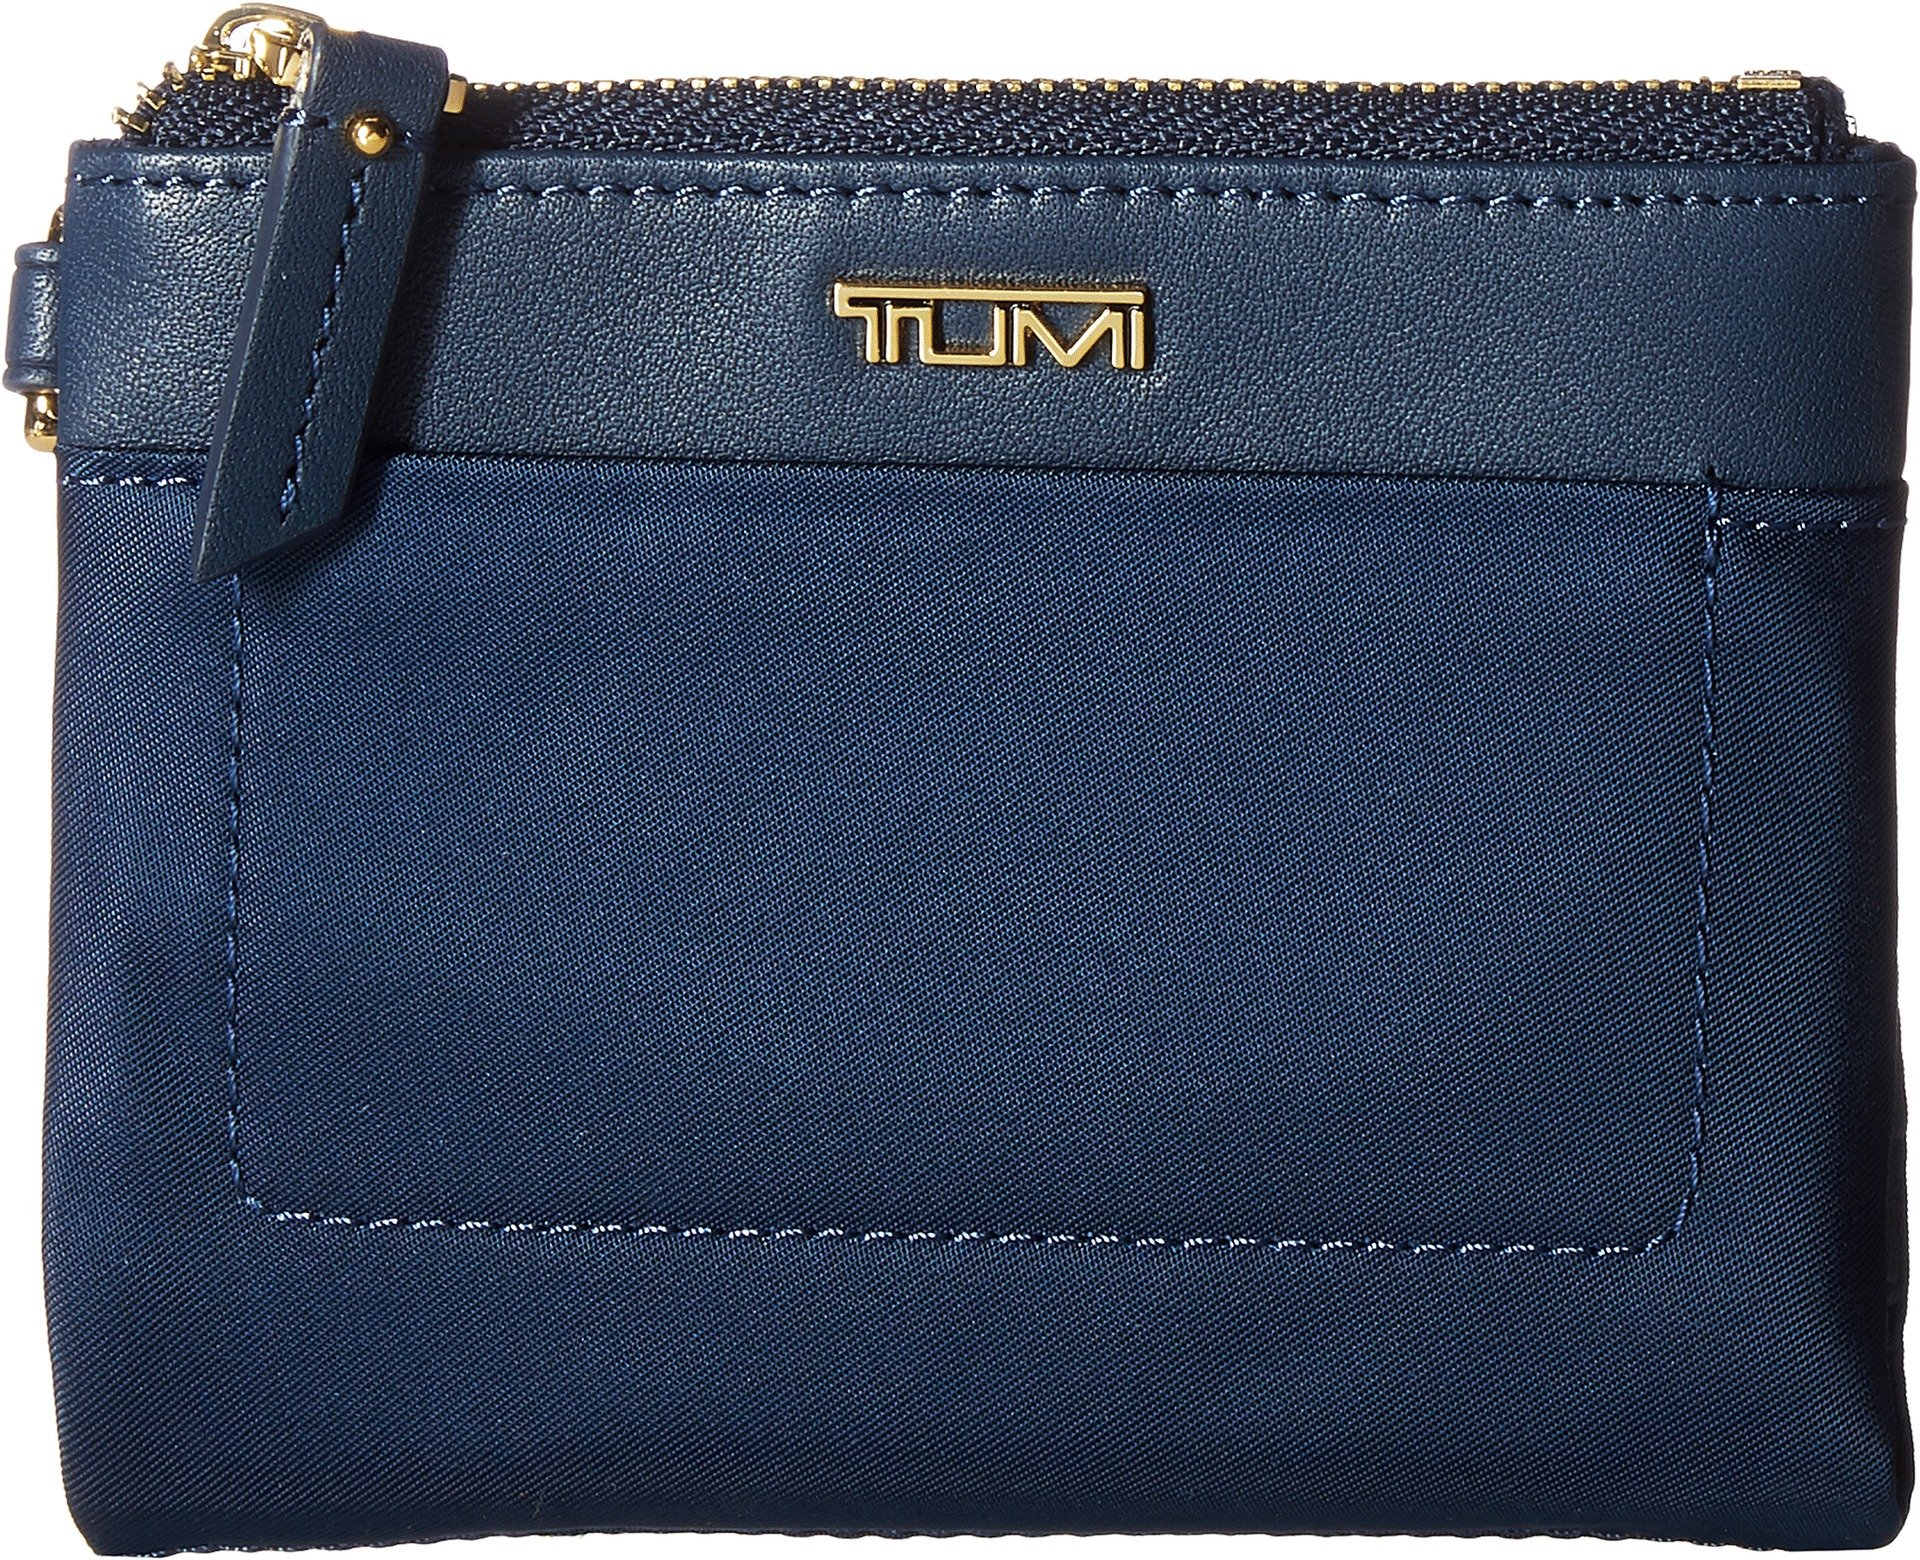 Tumi Women's Voyageur Double Zip Wallet Ocean Blue One Size by Tumi